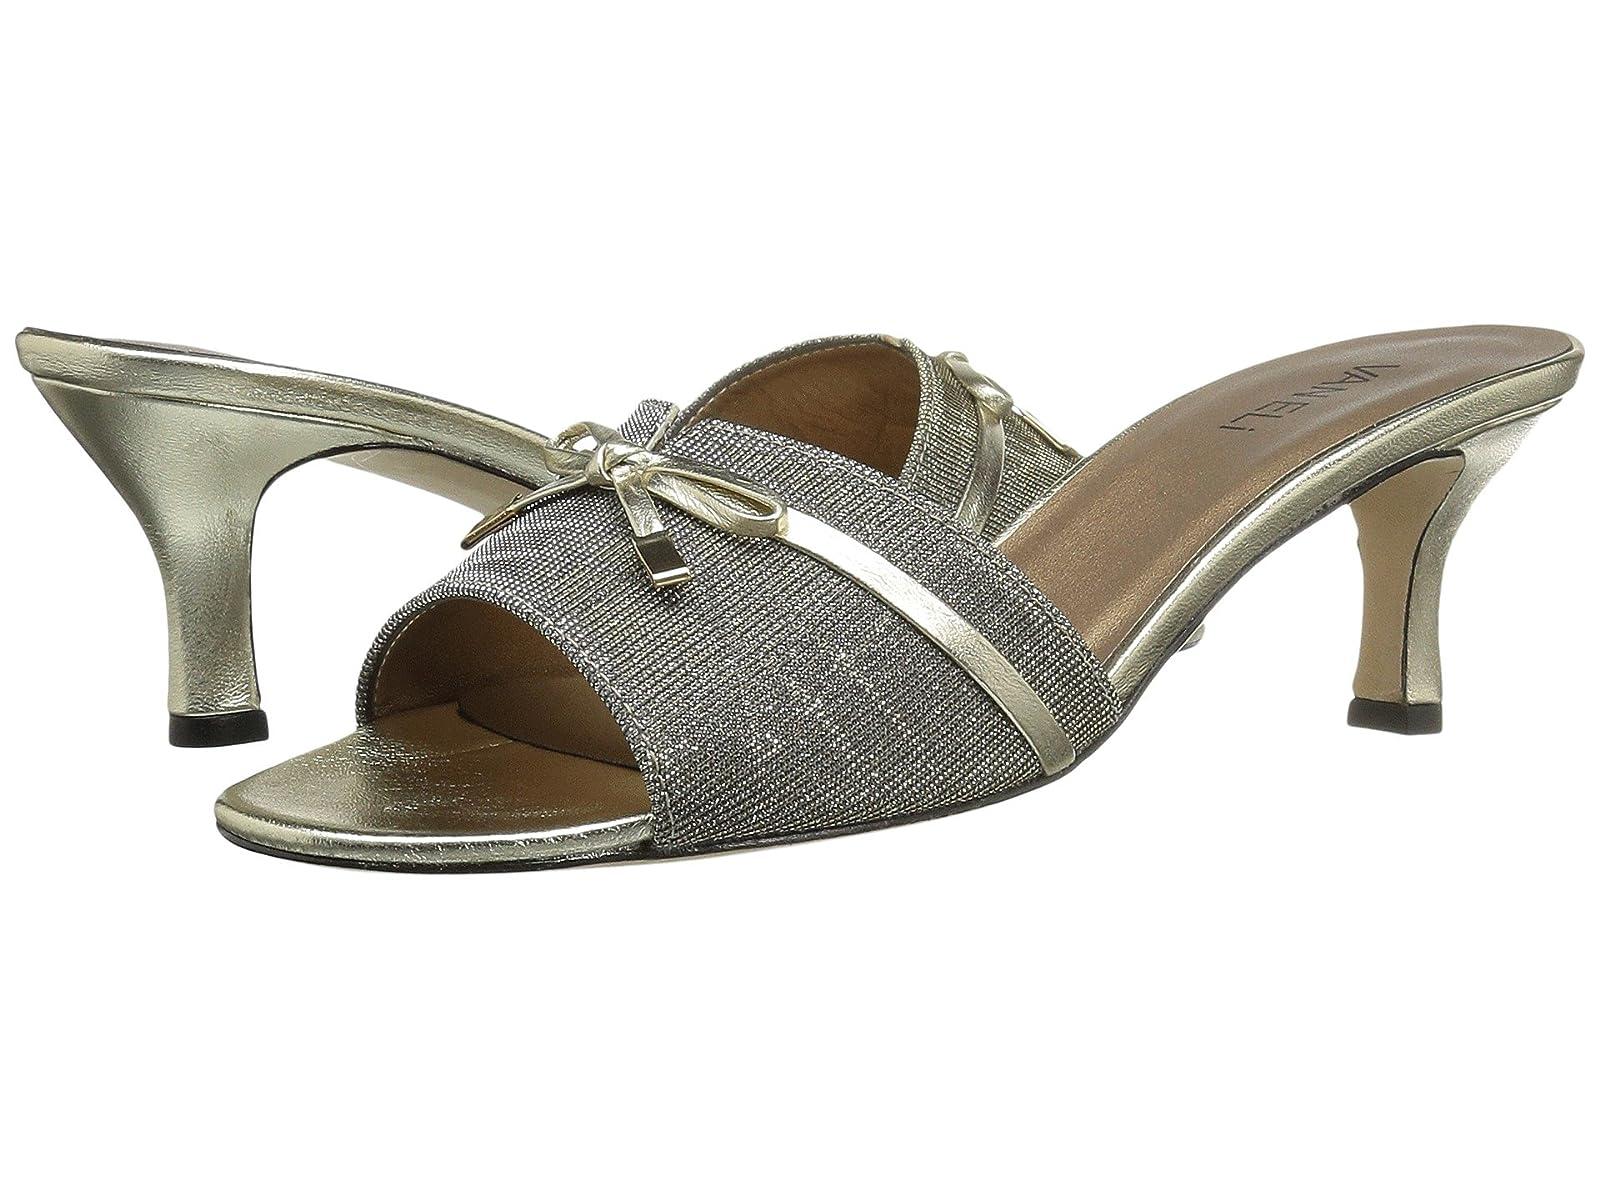 Vaneli MagodCheap and distinctive eye-catching shoes